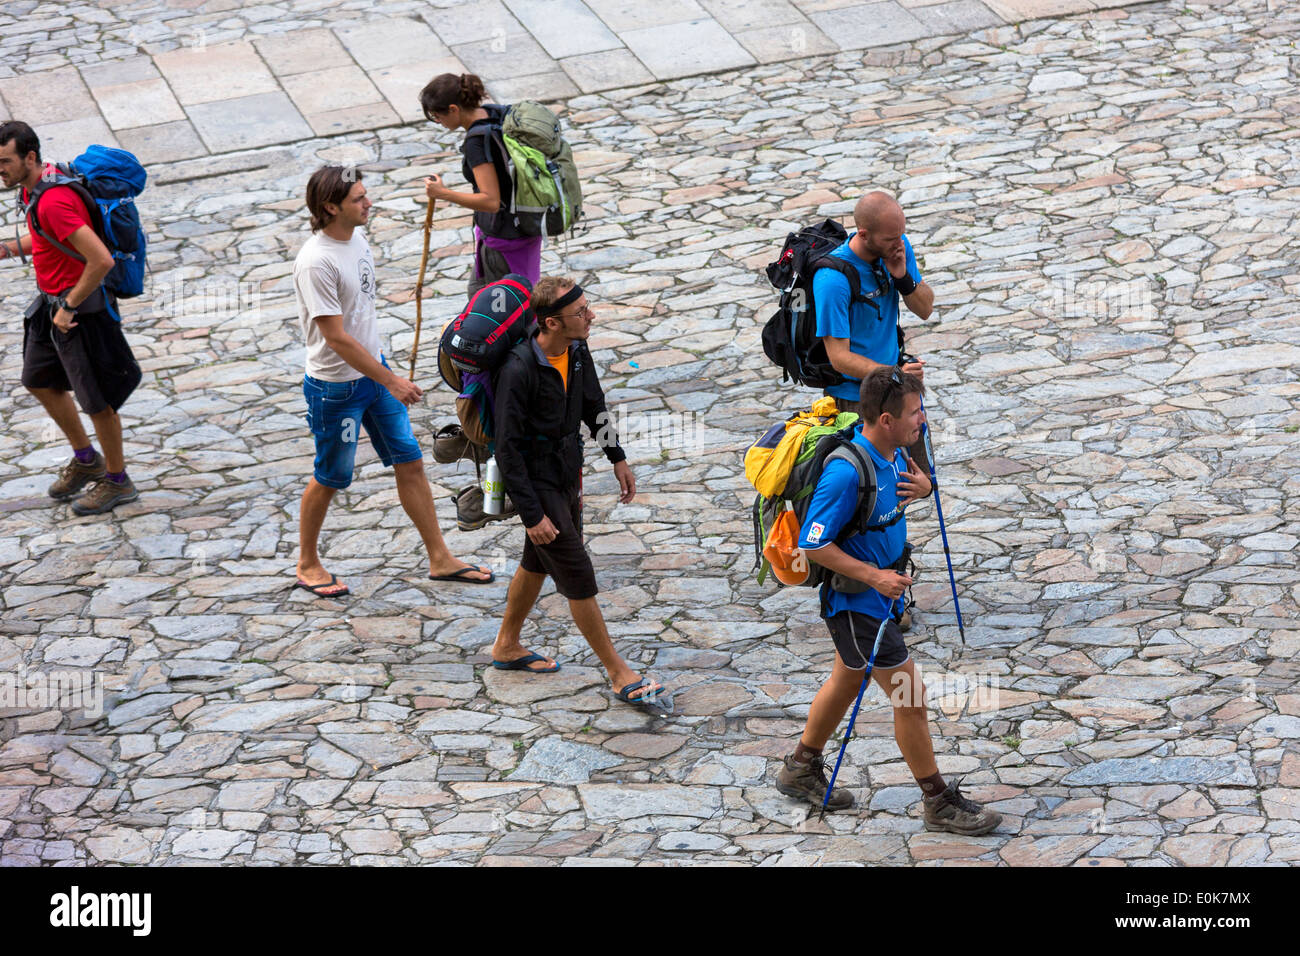 Pilgrims with walking poles end pilgrimage Camino de Santiago in Cathedral square of Santiago de Compostela, Galicia, Spain - Stock Image